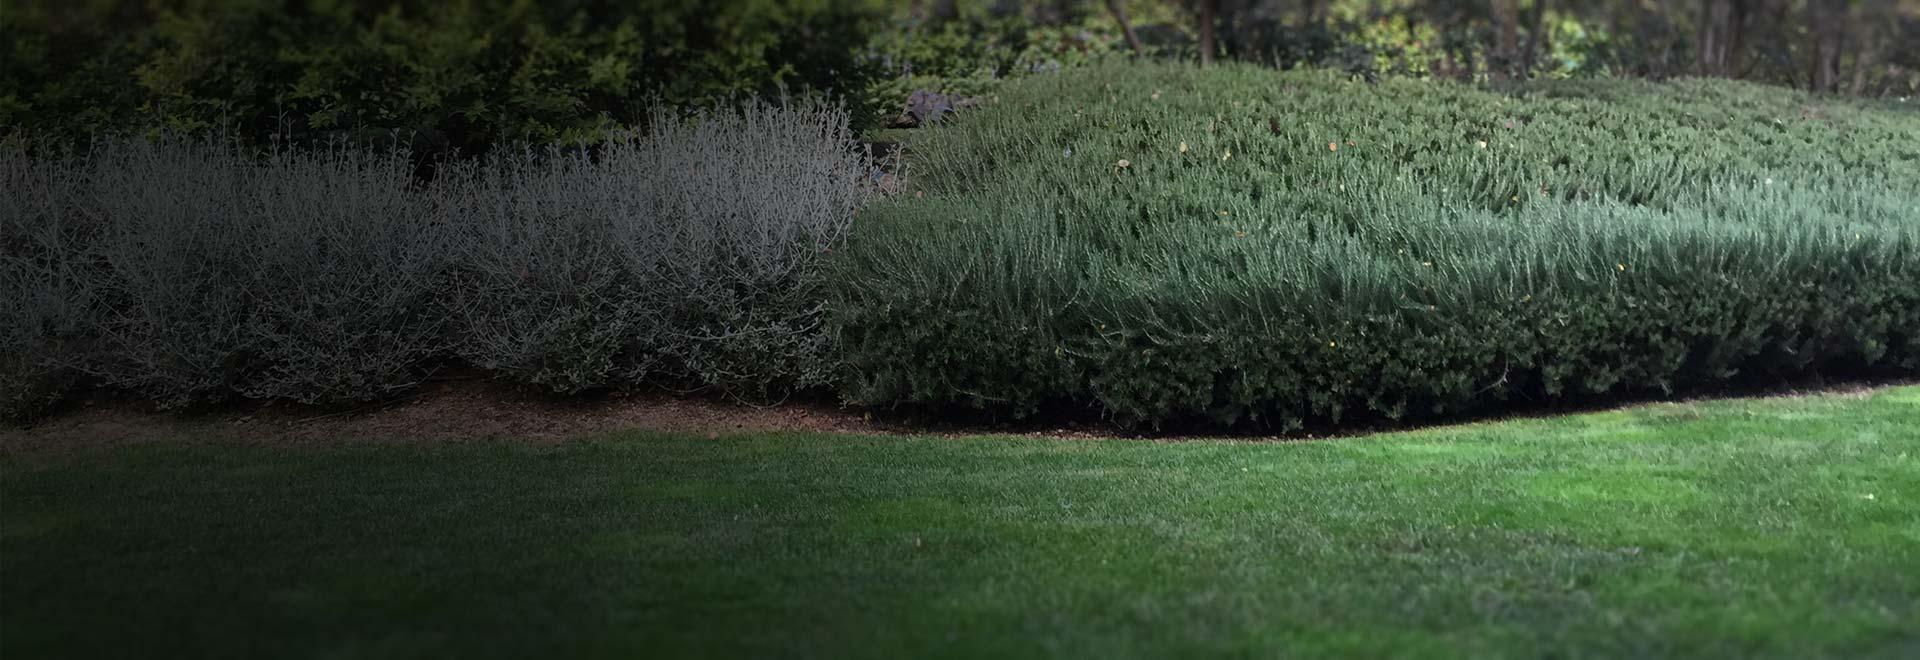 Imprese Giardinaggio Laquila